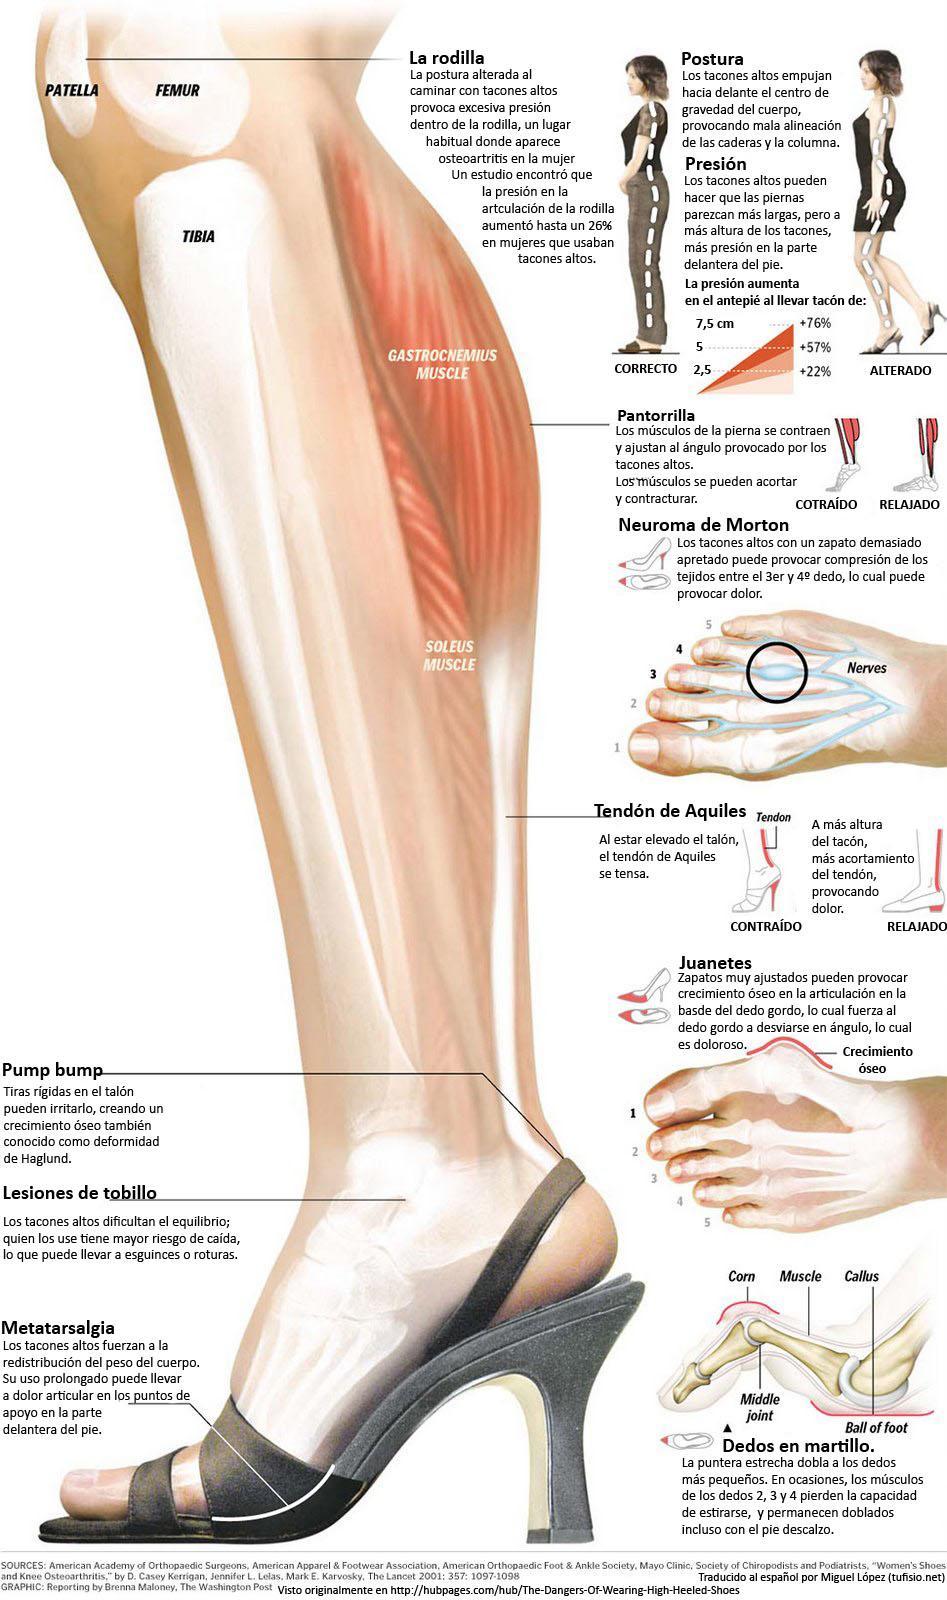 Fisioterapia: ¿Es Perjudicial usar tacones muy altos?